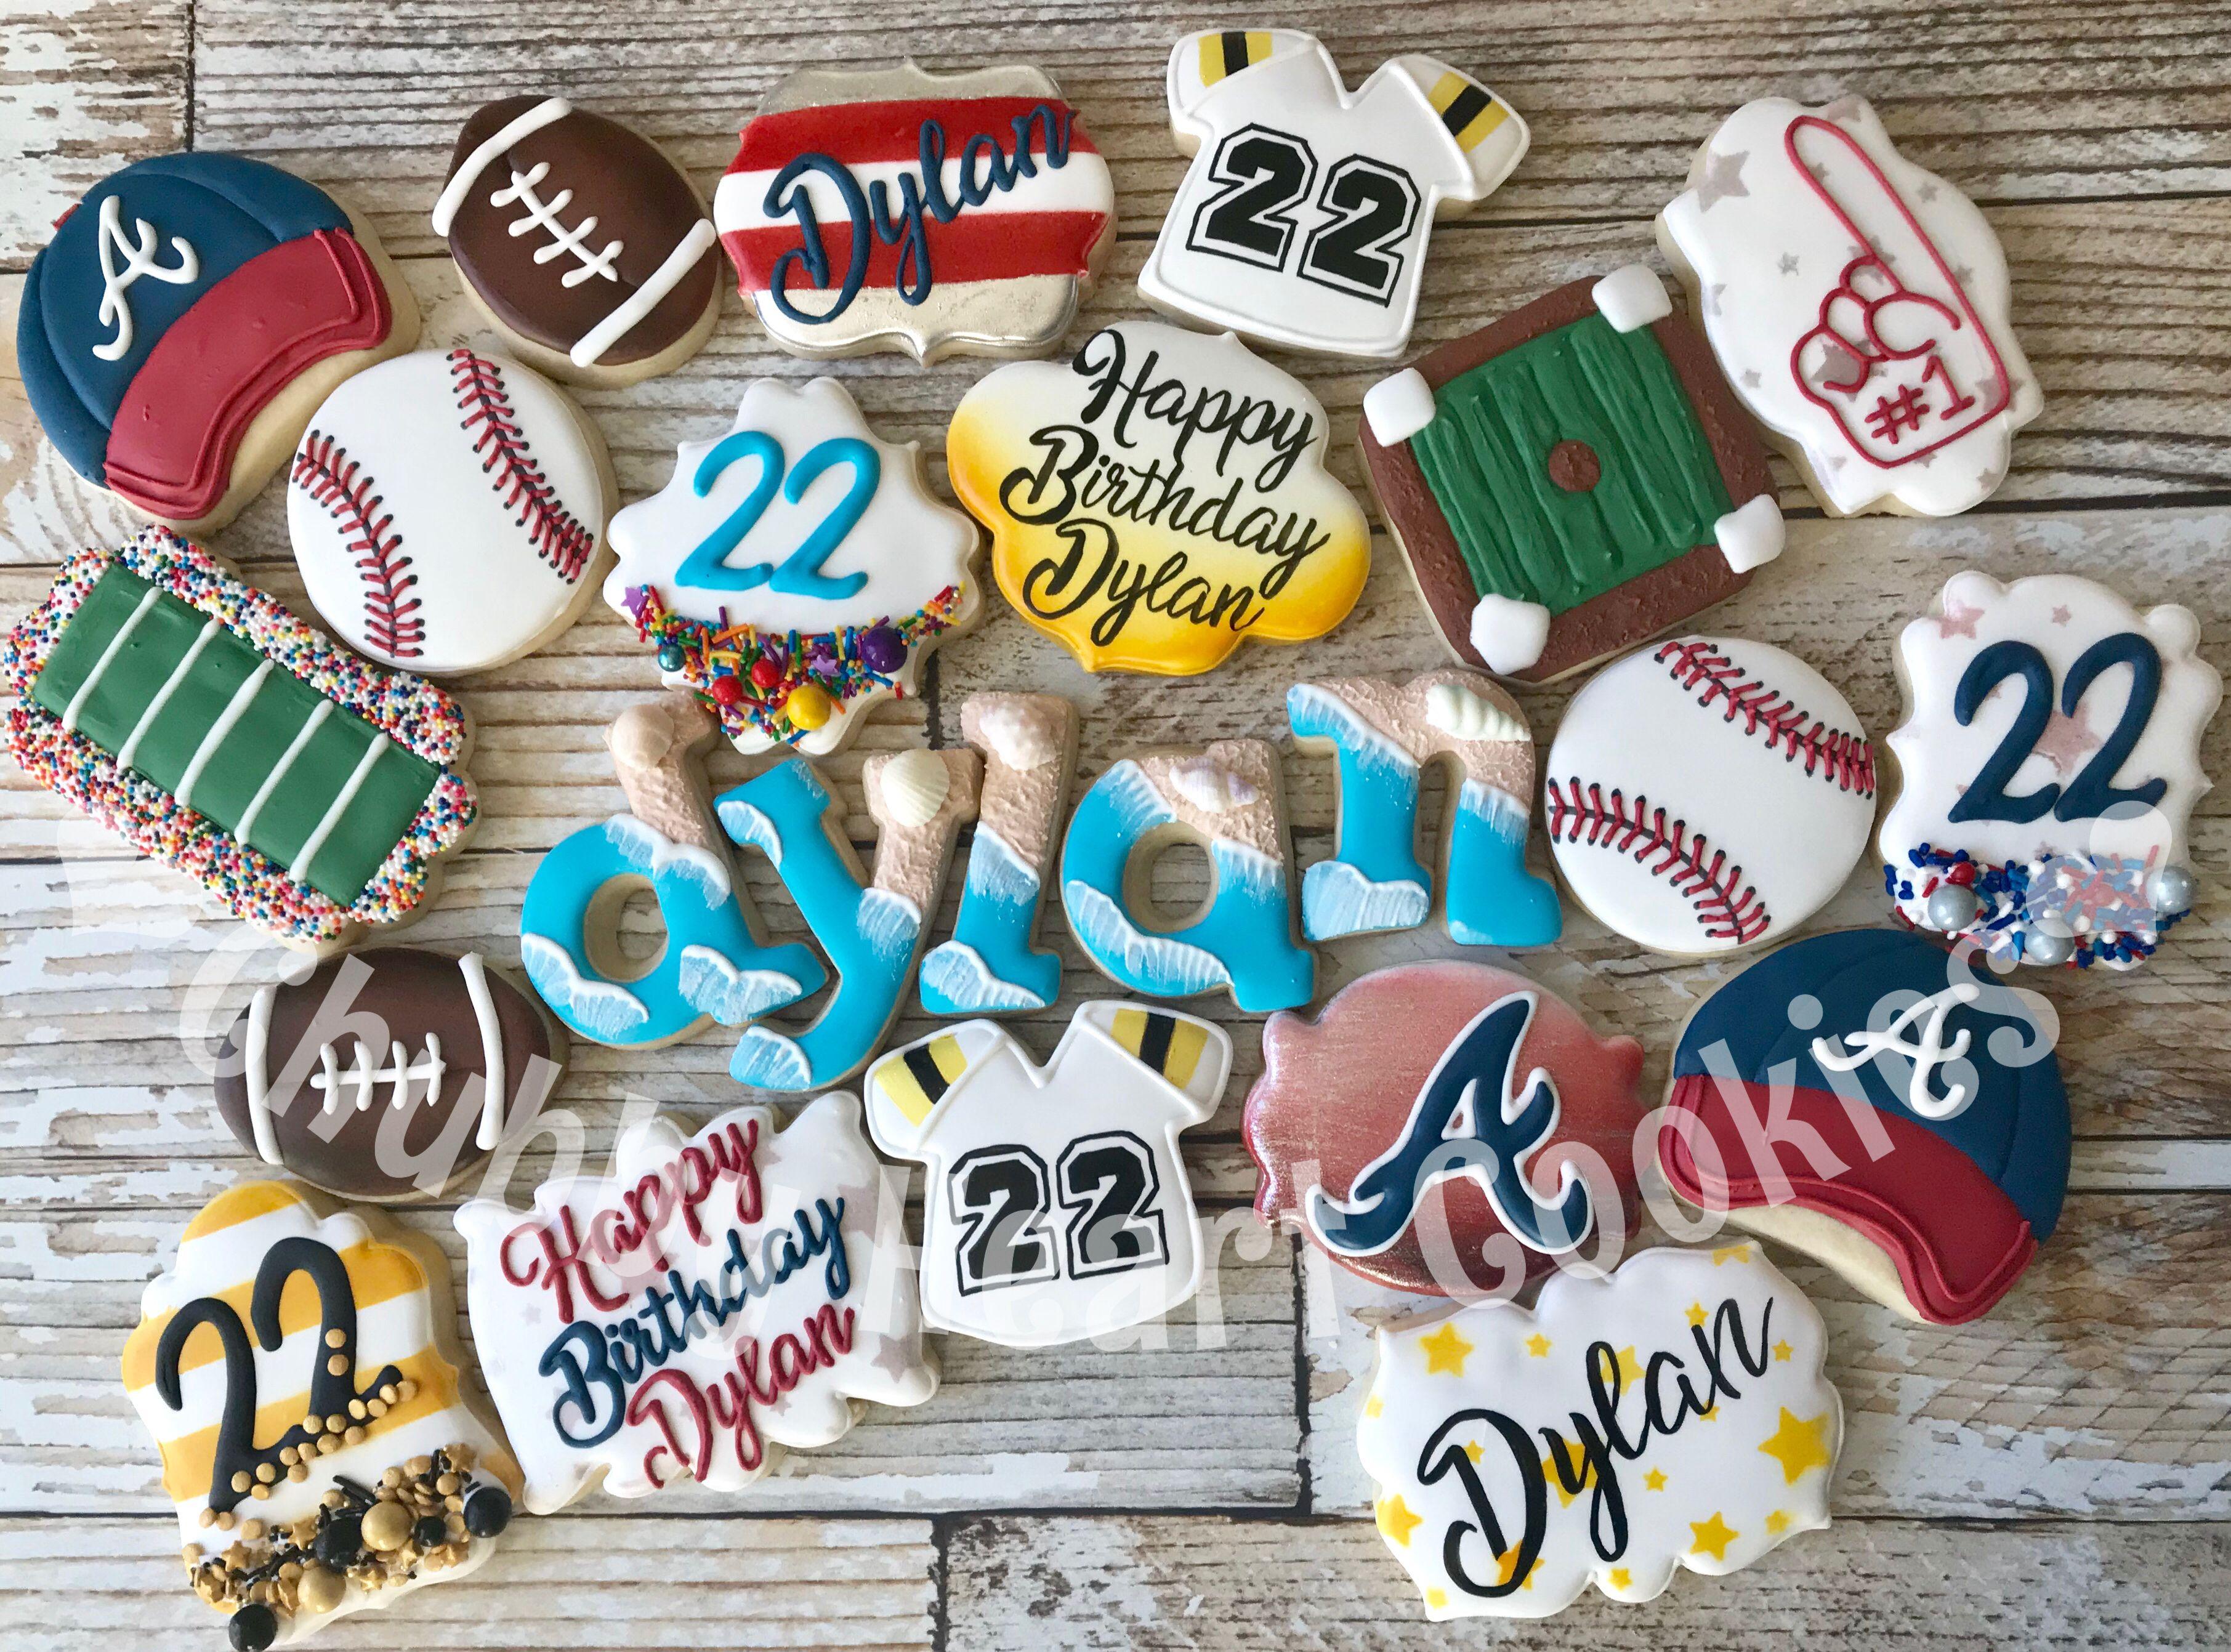 Beach Baseball Football Atlanta Braves Birthday Cookies Heart Cookies Yummy Cookies